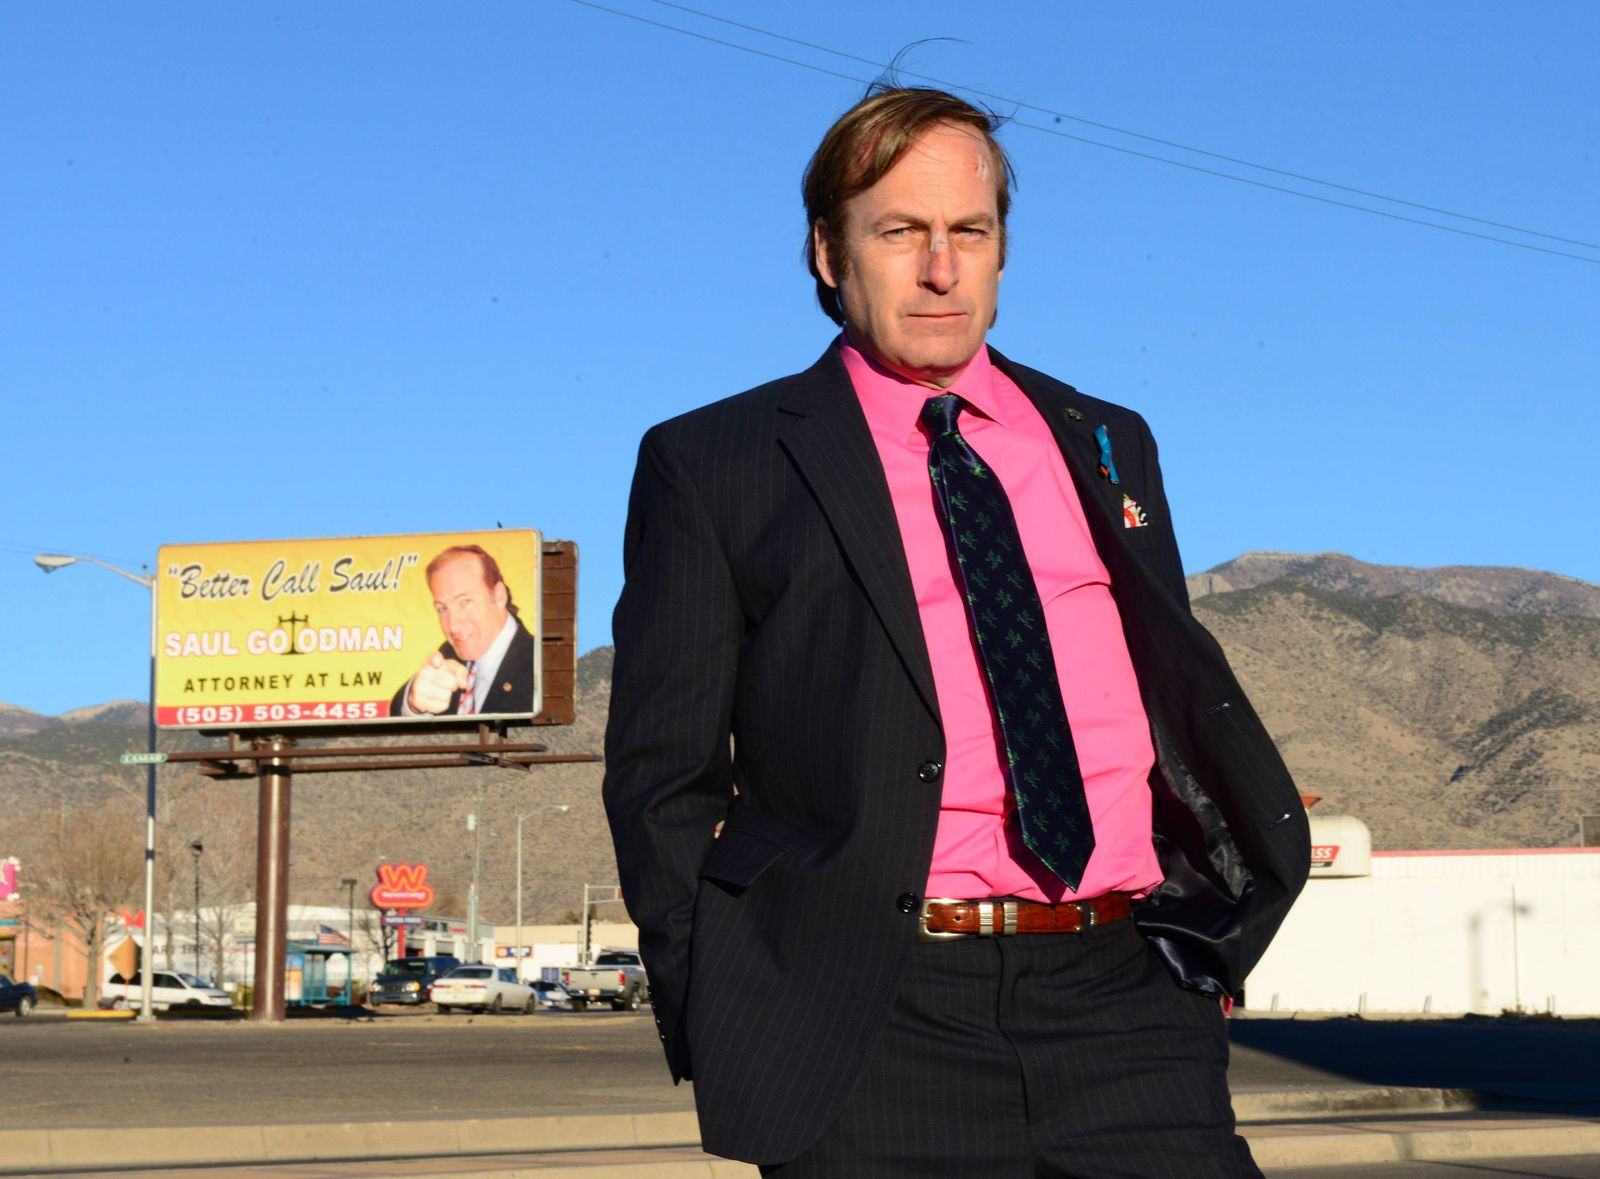 EINMALIGE VERWENDUNG TV-Better Call Saul